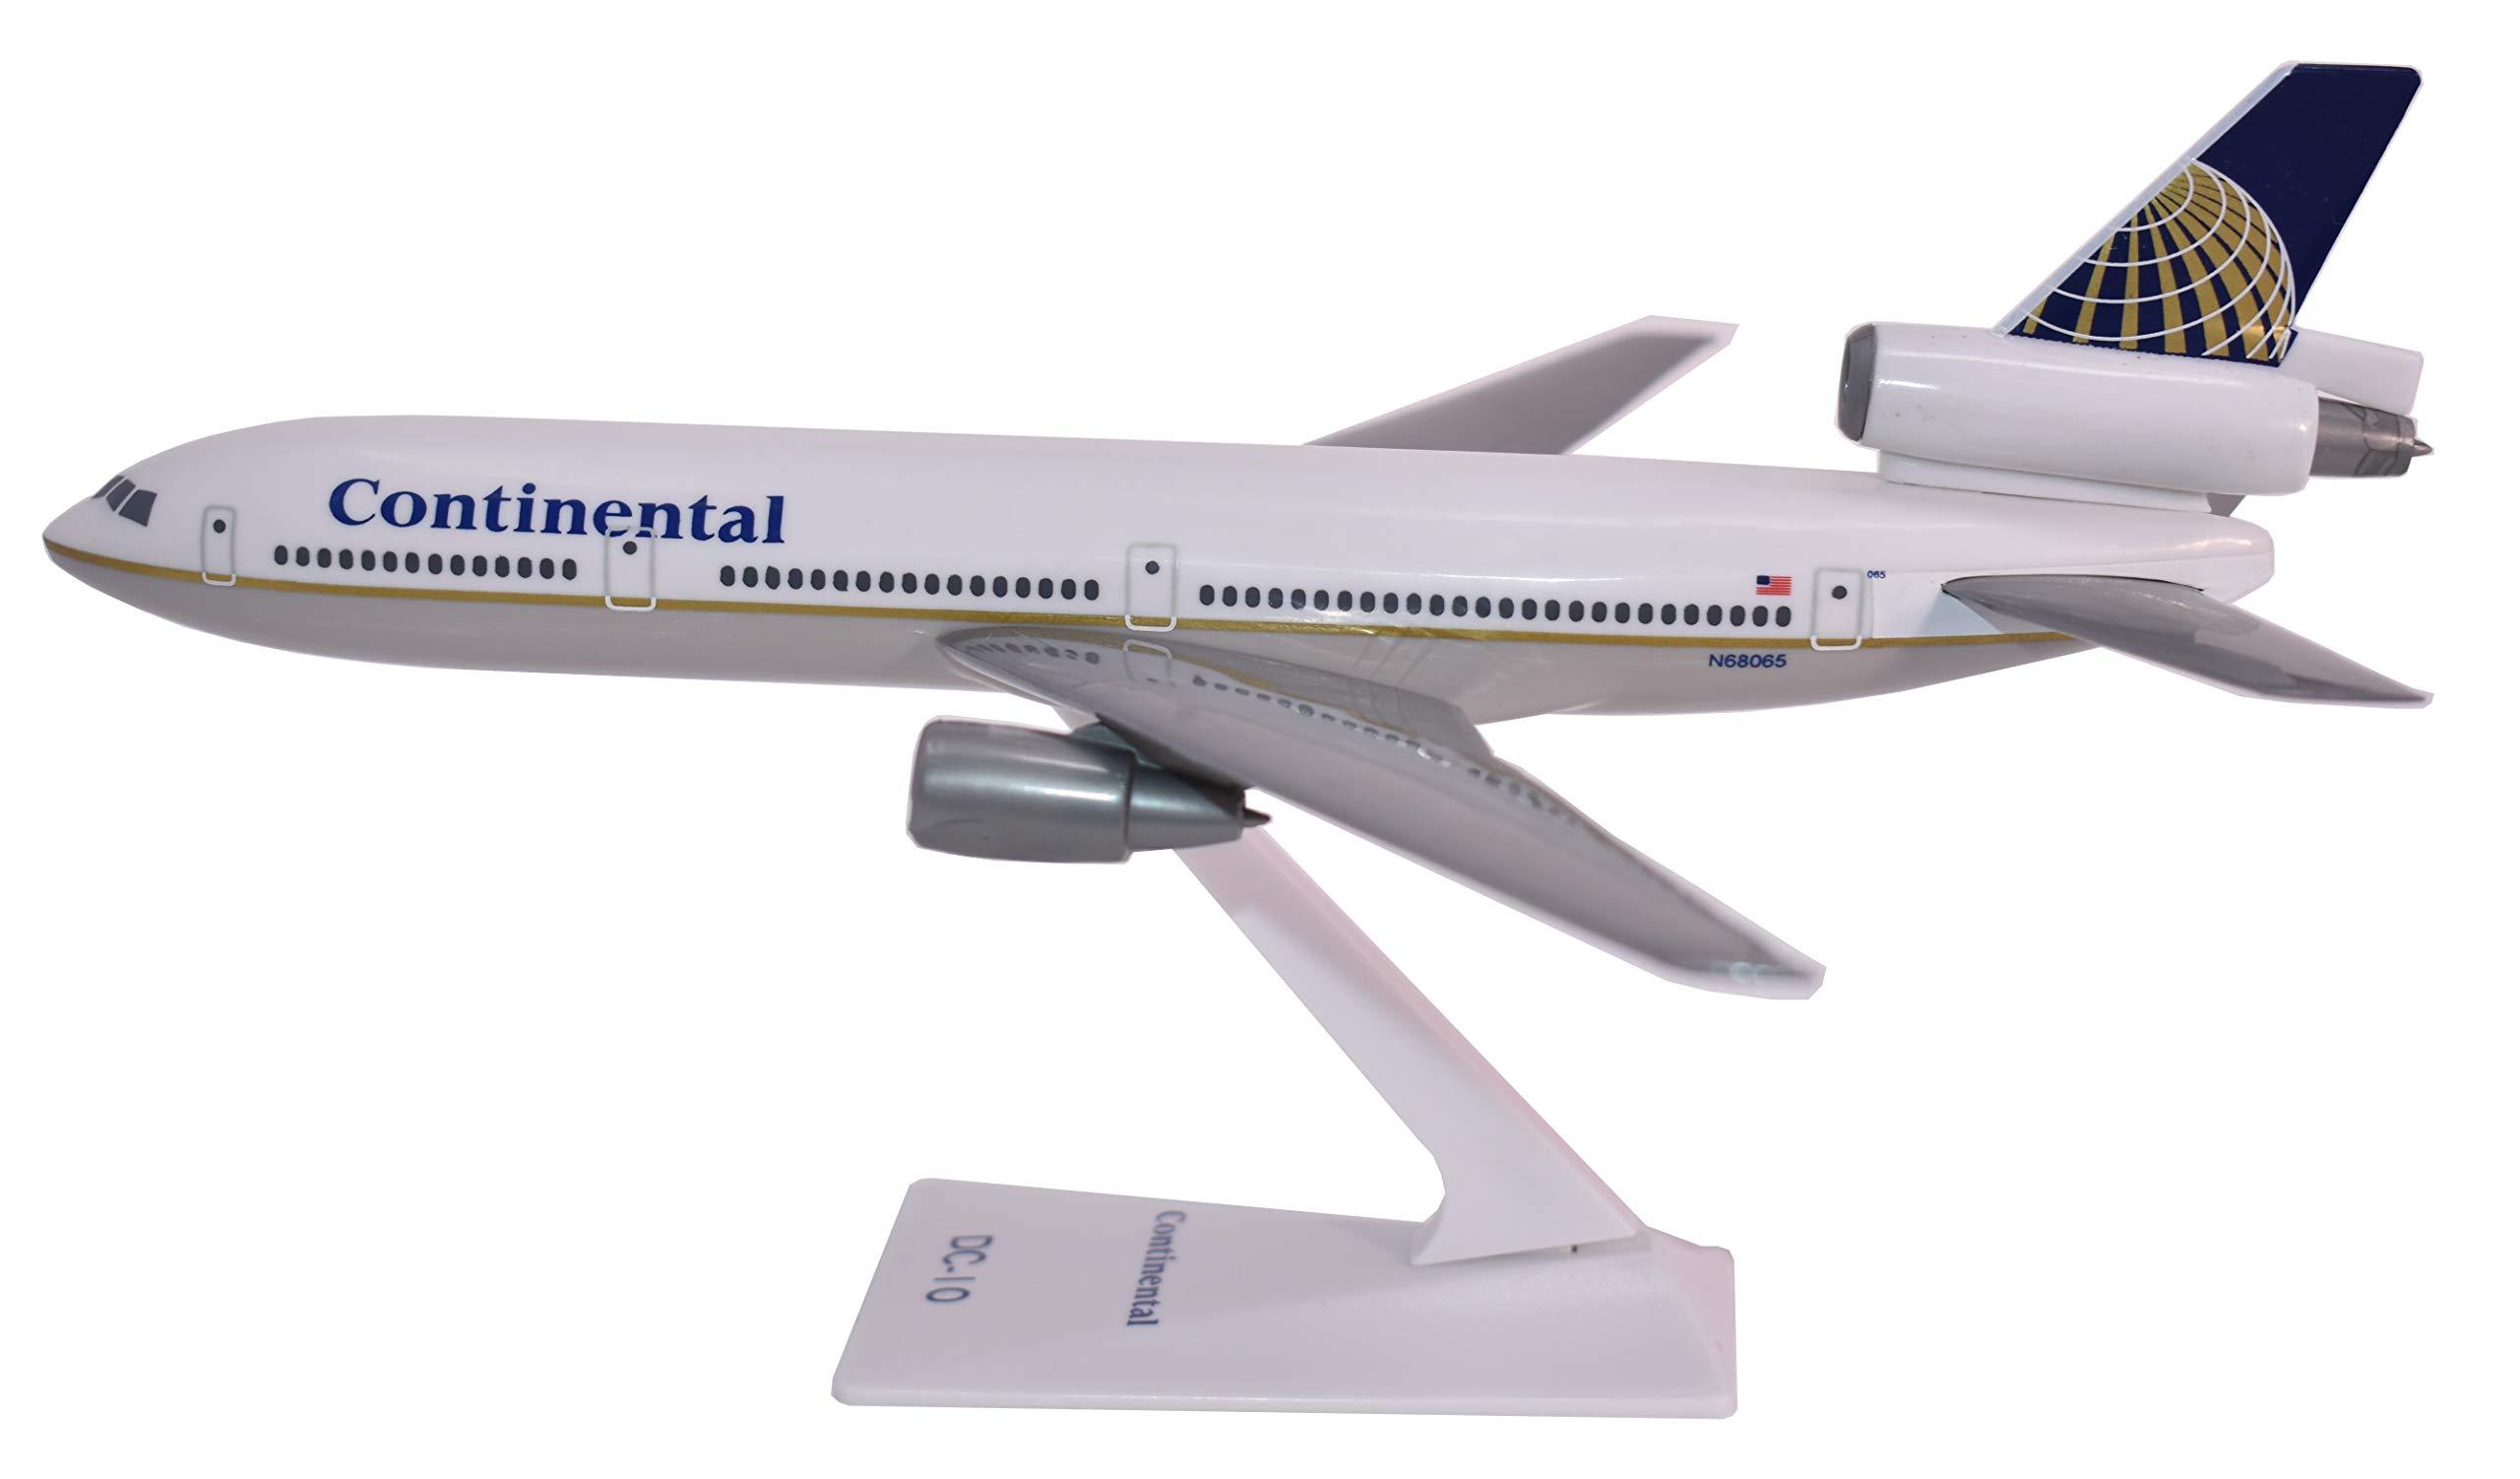 Flight Miniatures Continental Airlines Douglas DC-10 1:250 Scale